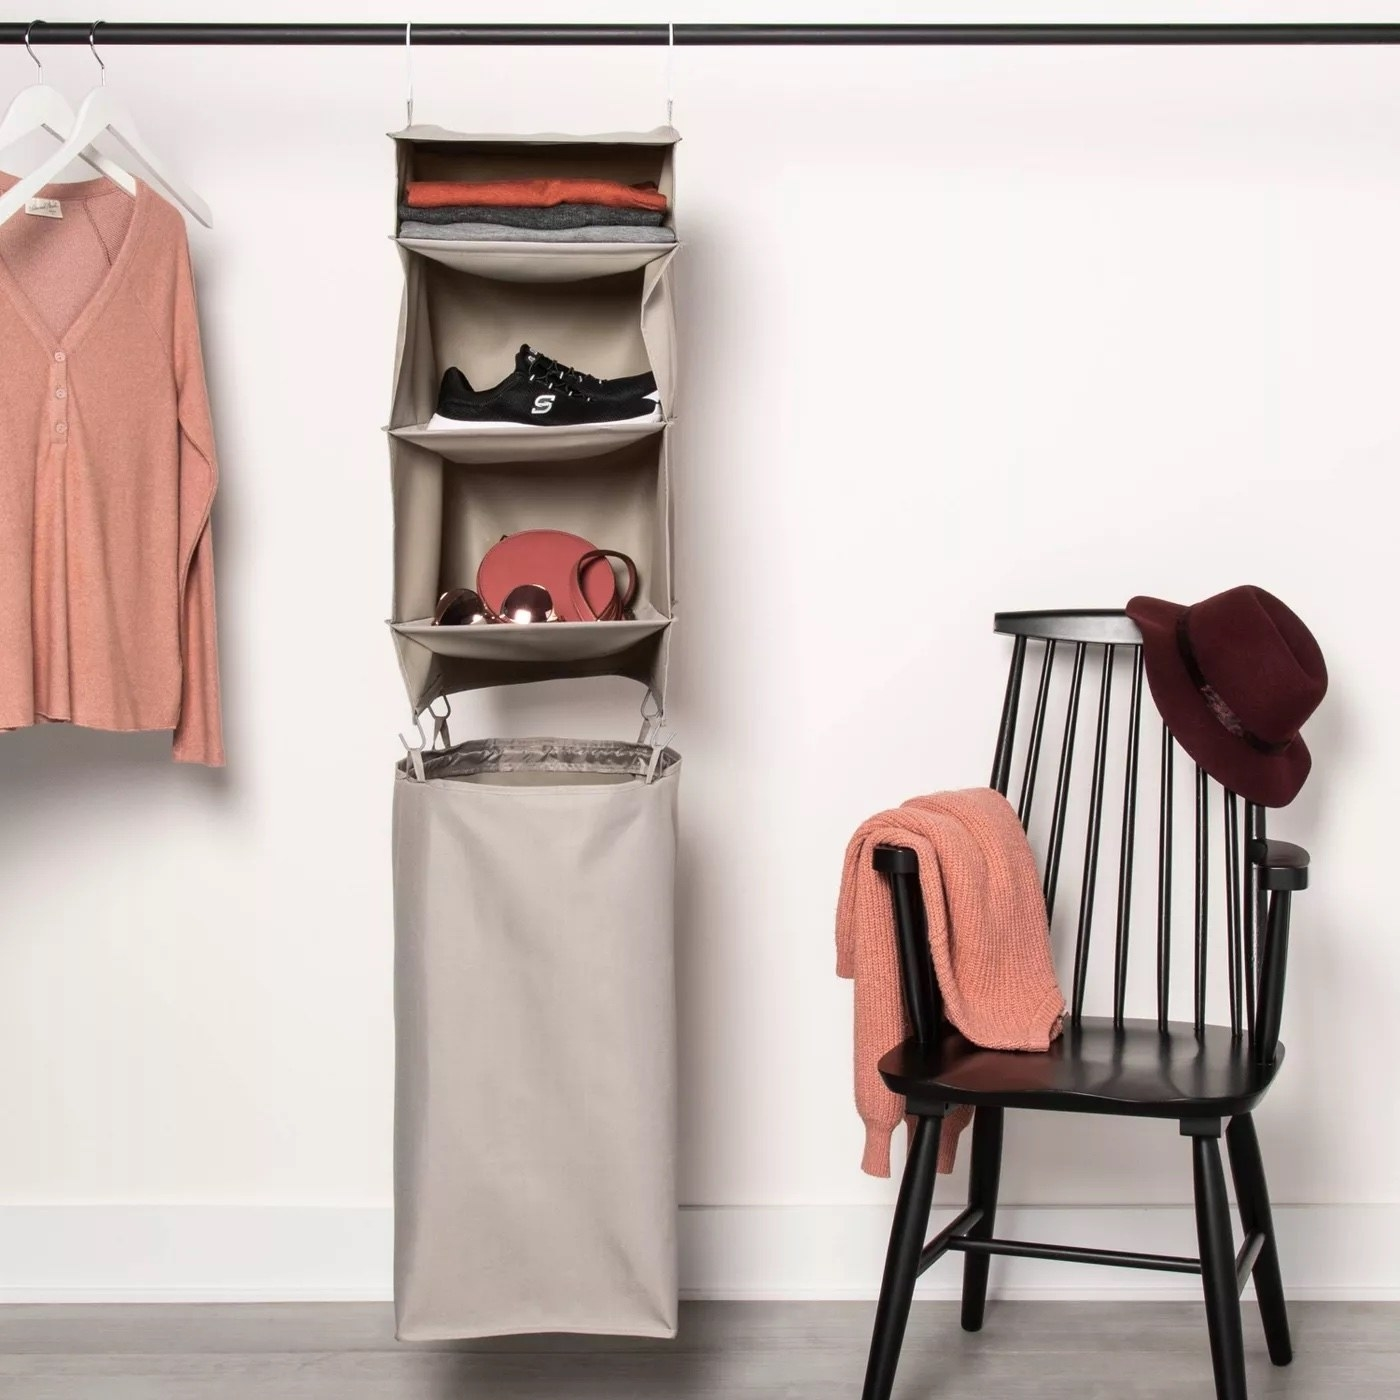 The hanging closet organizer in a closet